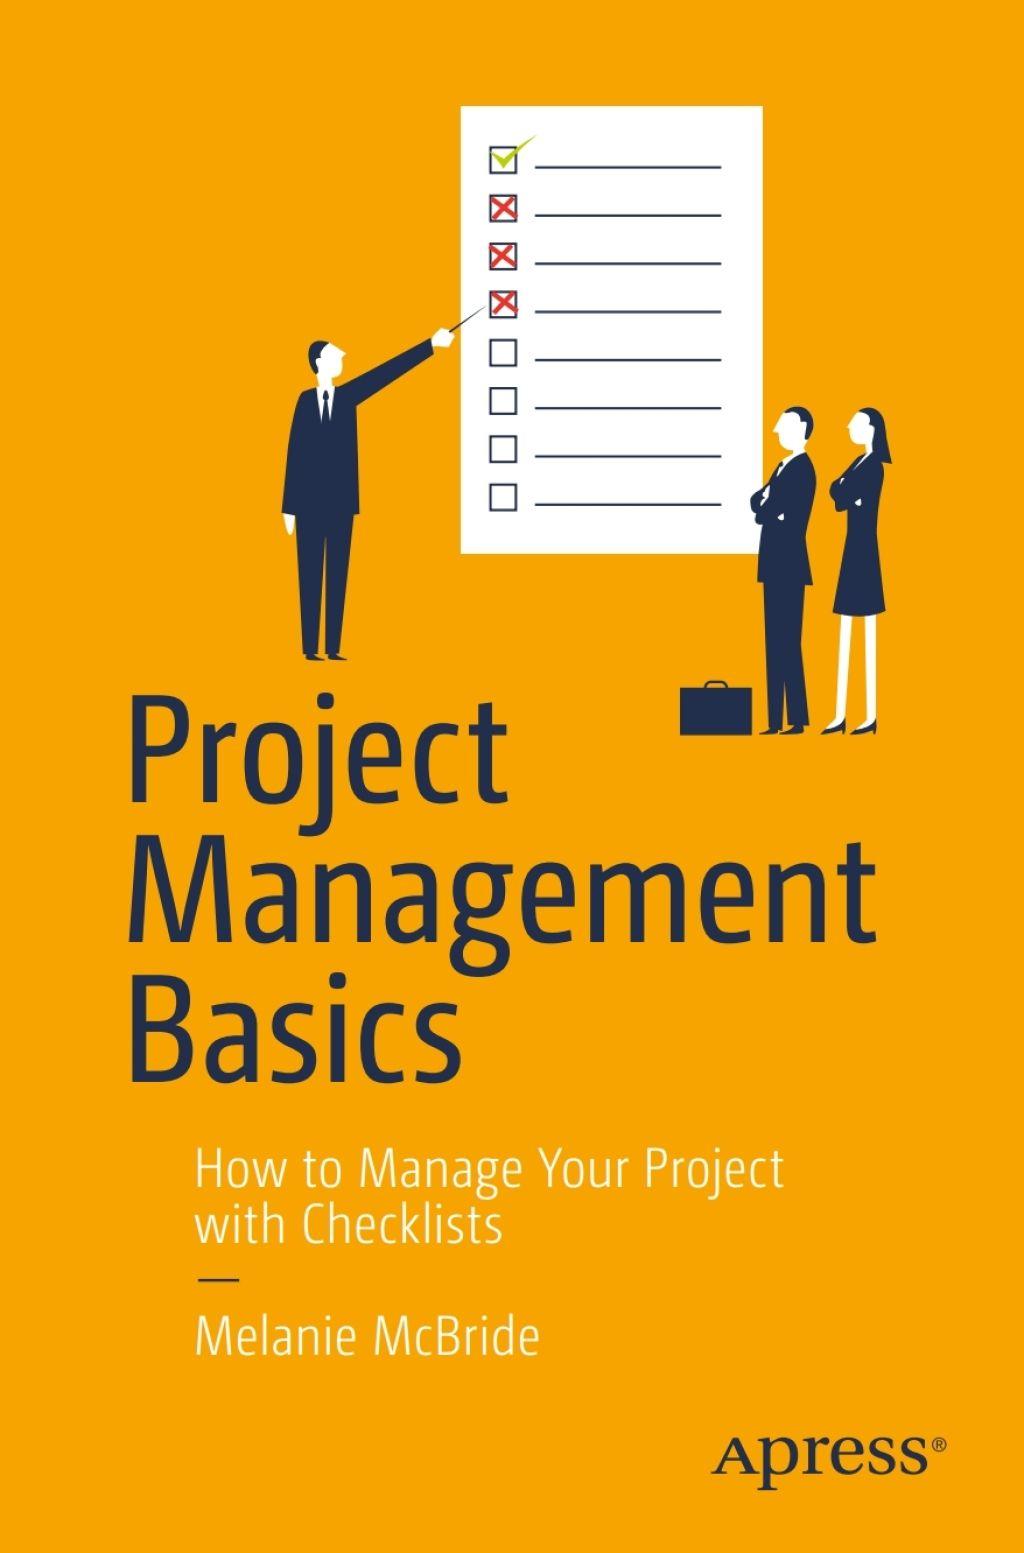 Project Management Basics (eBook) (With images) Program